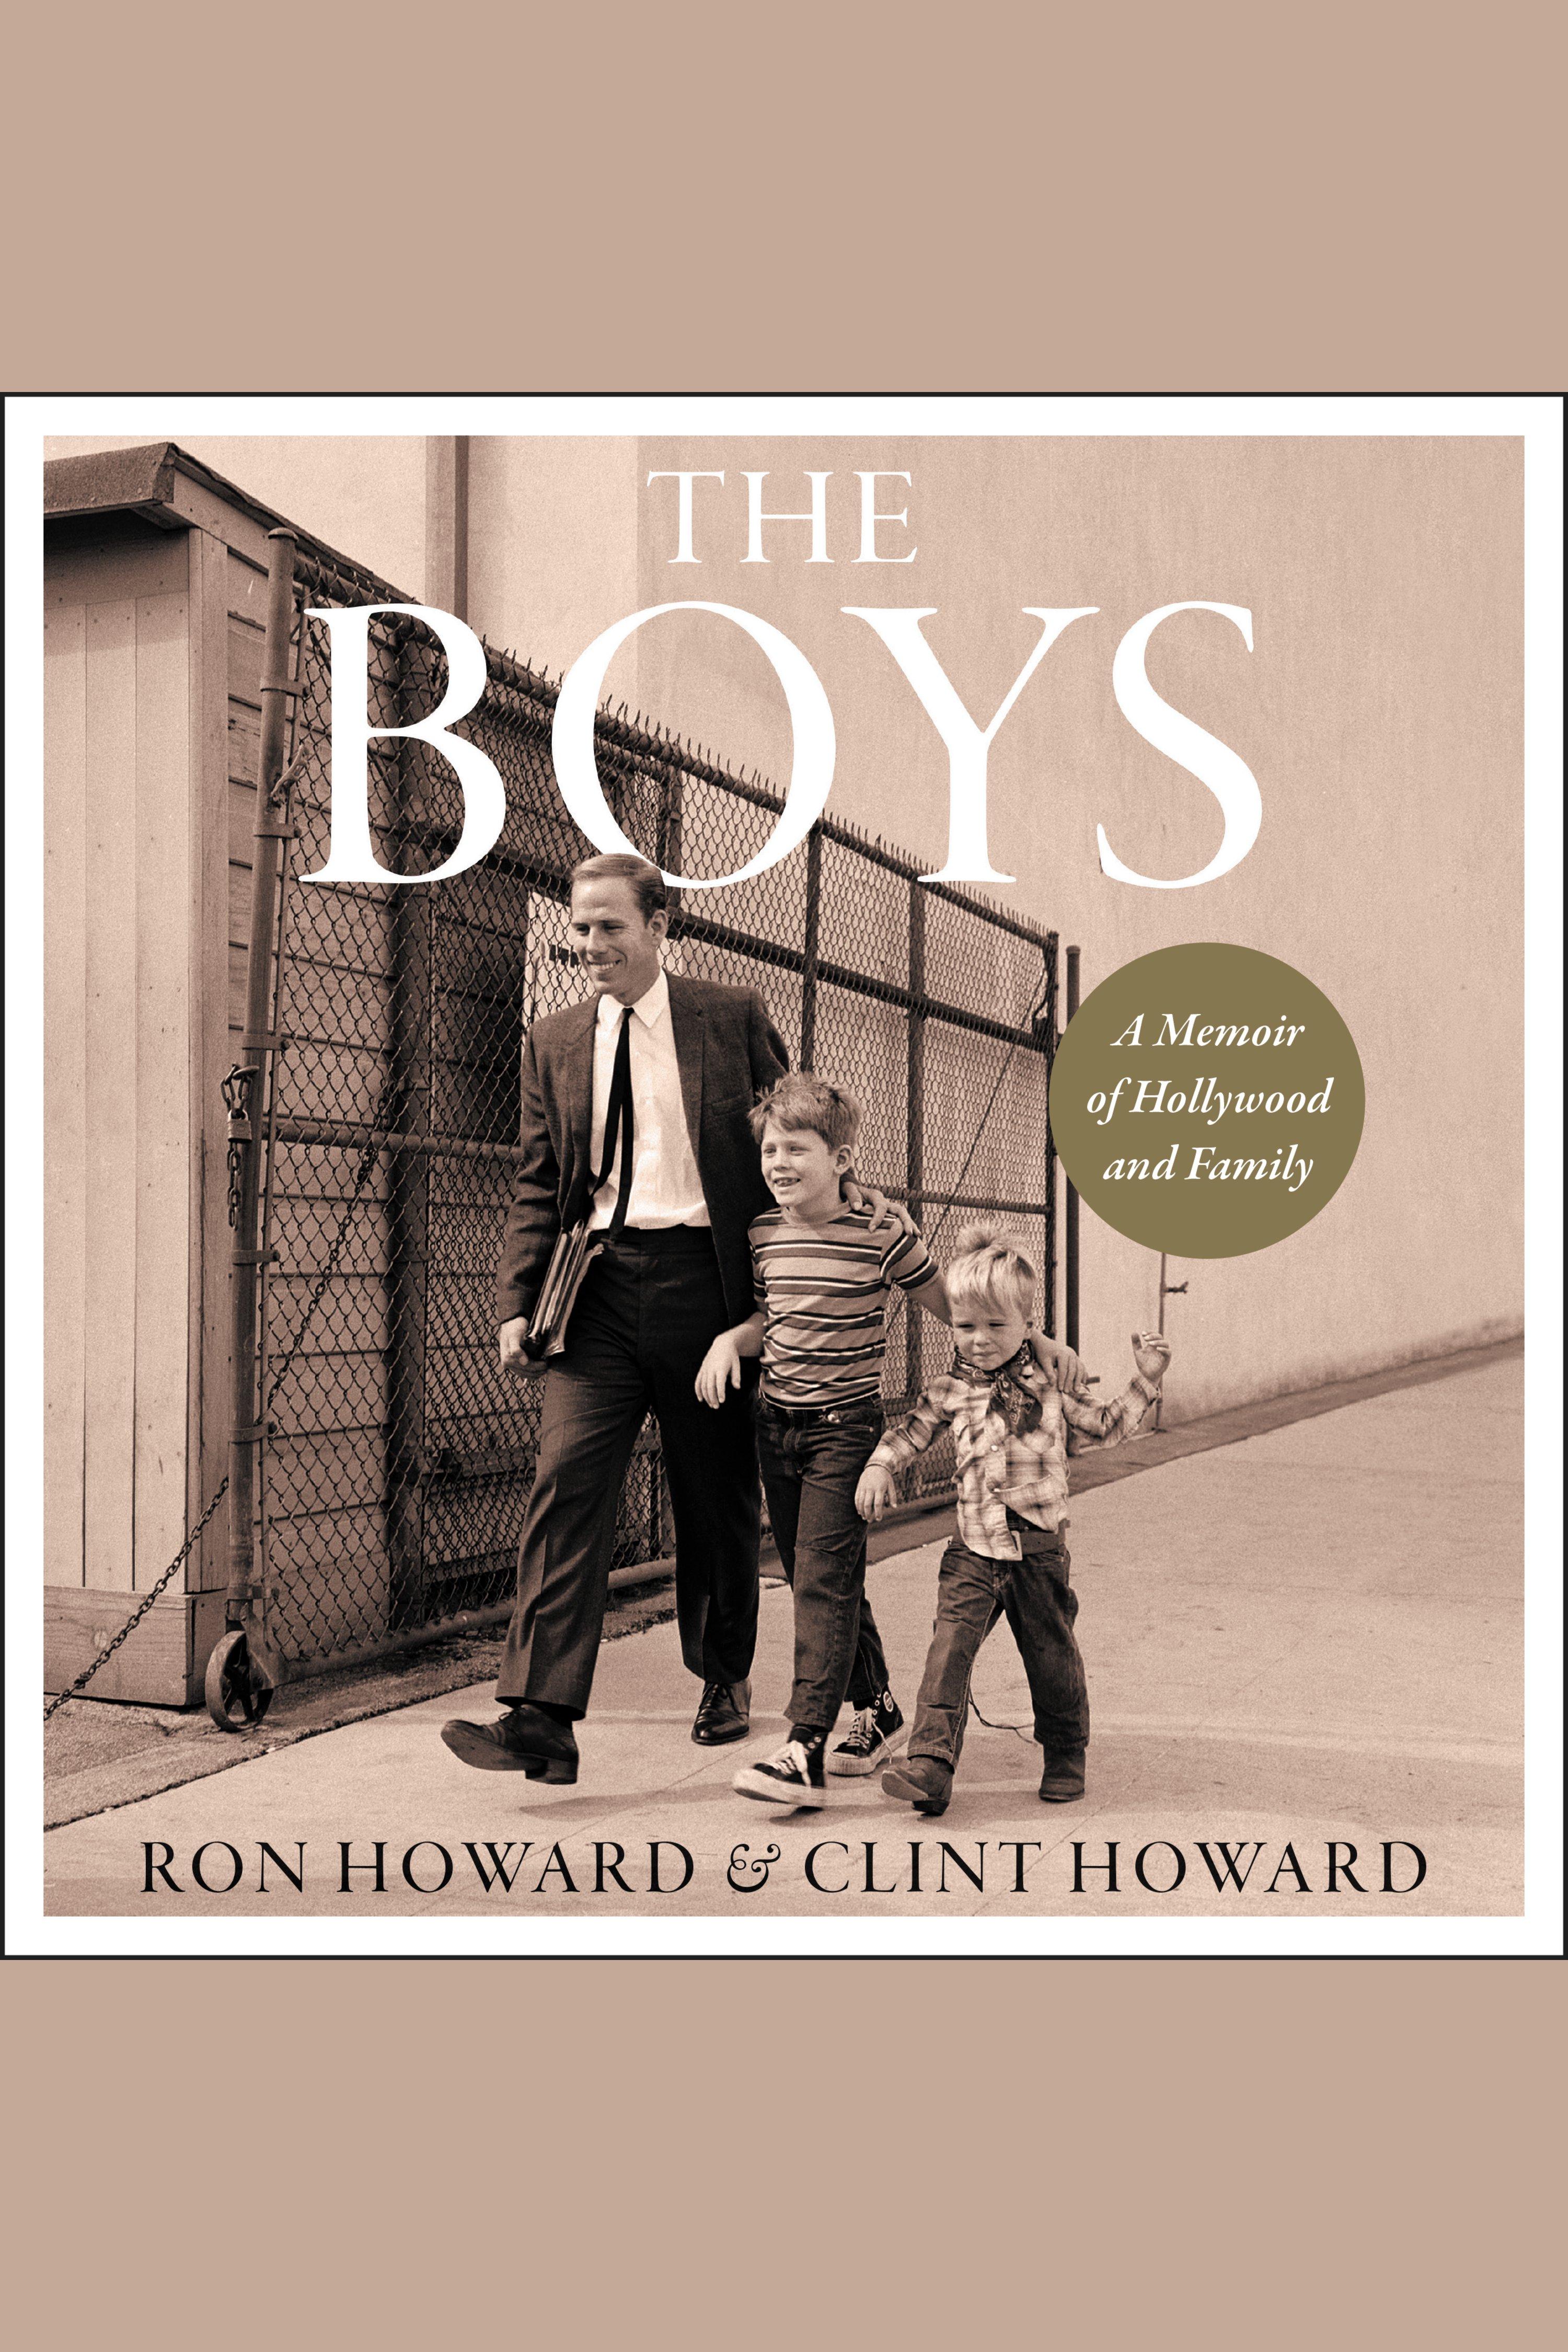 Boys, The A Memoir of Hollywood and Family